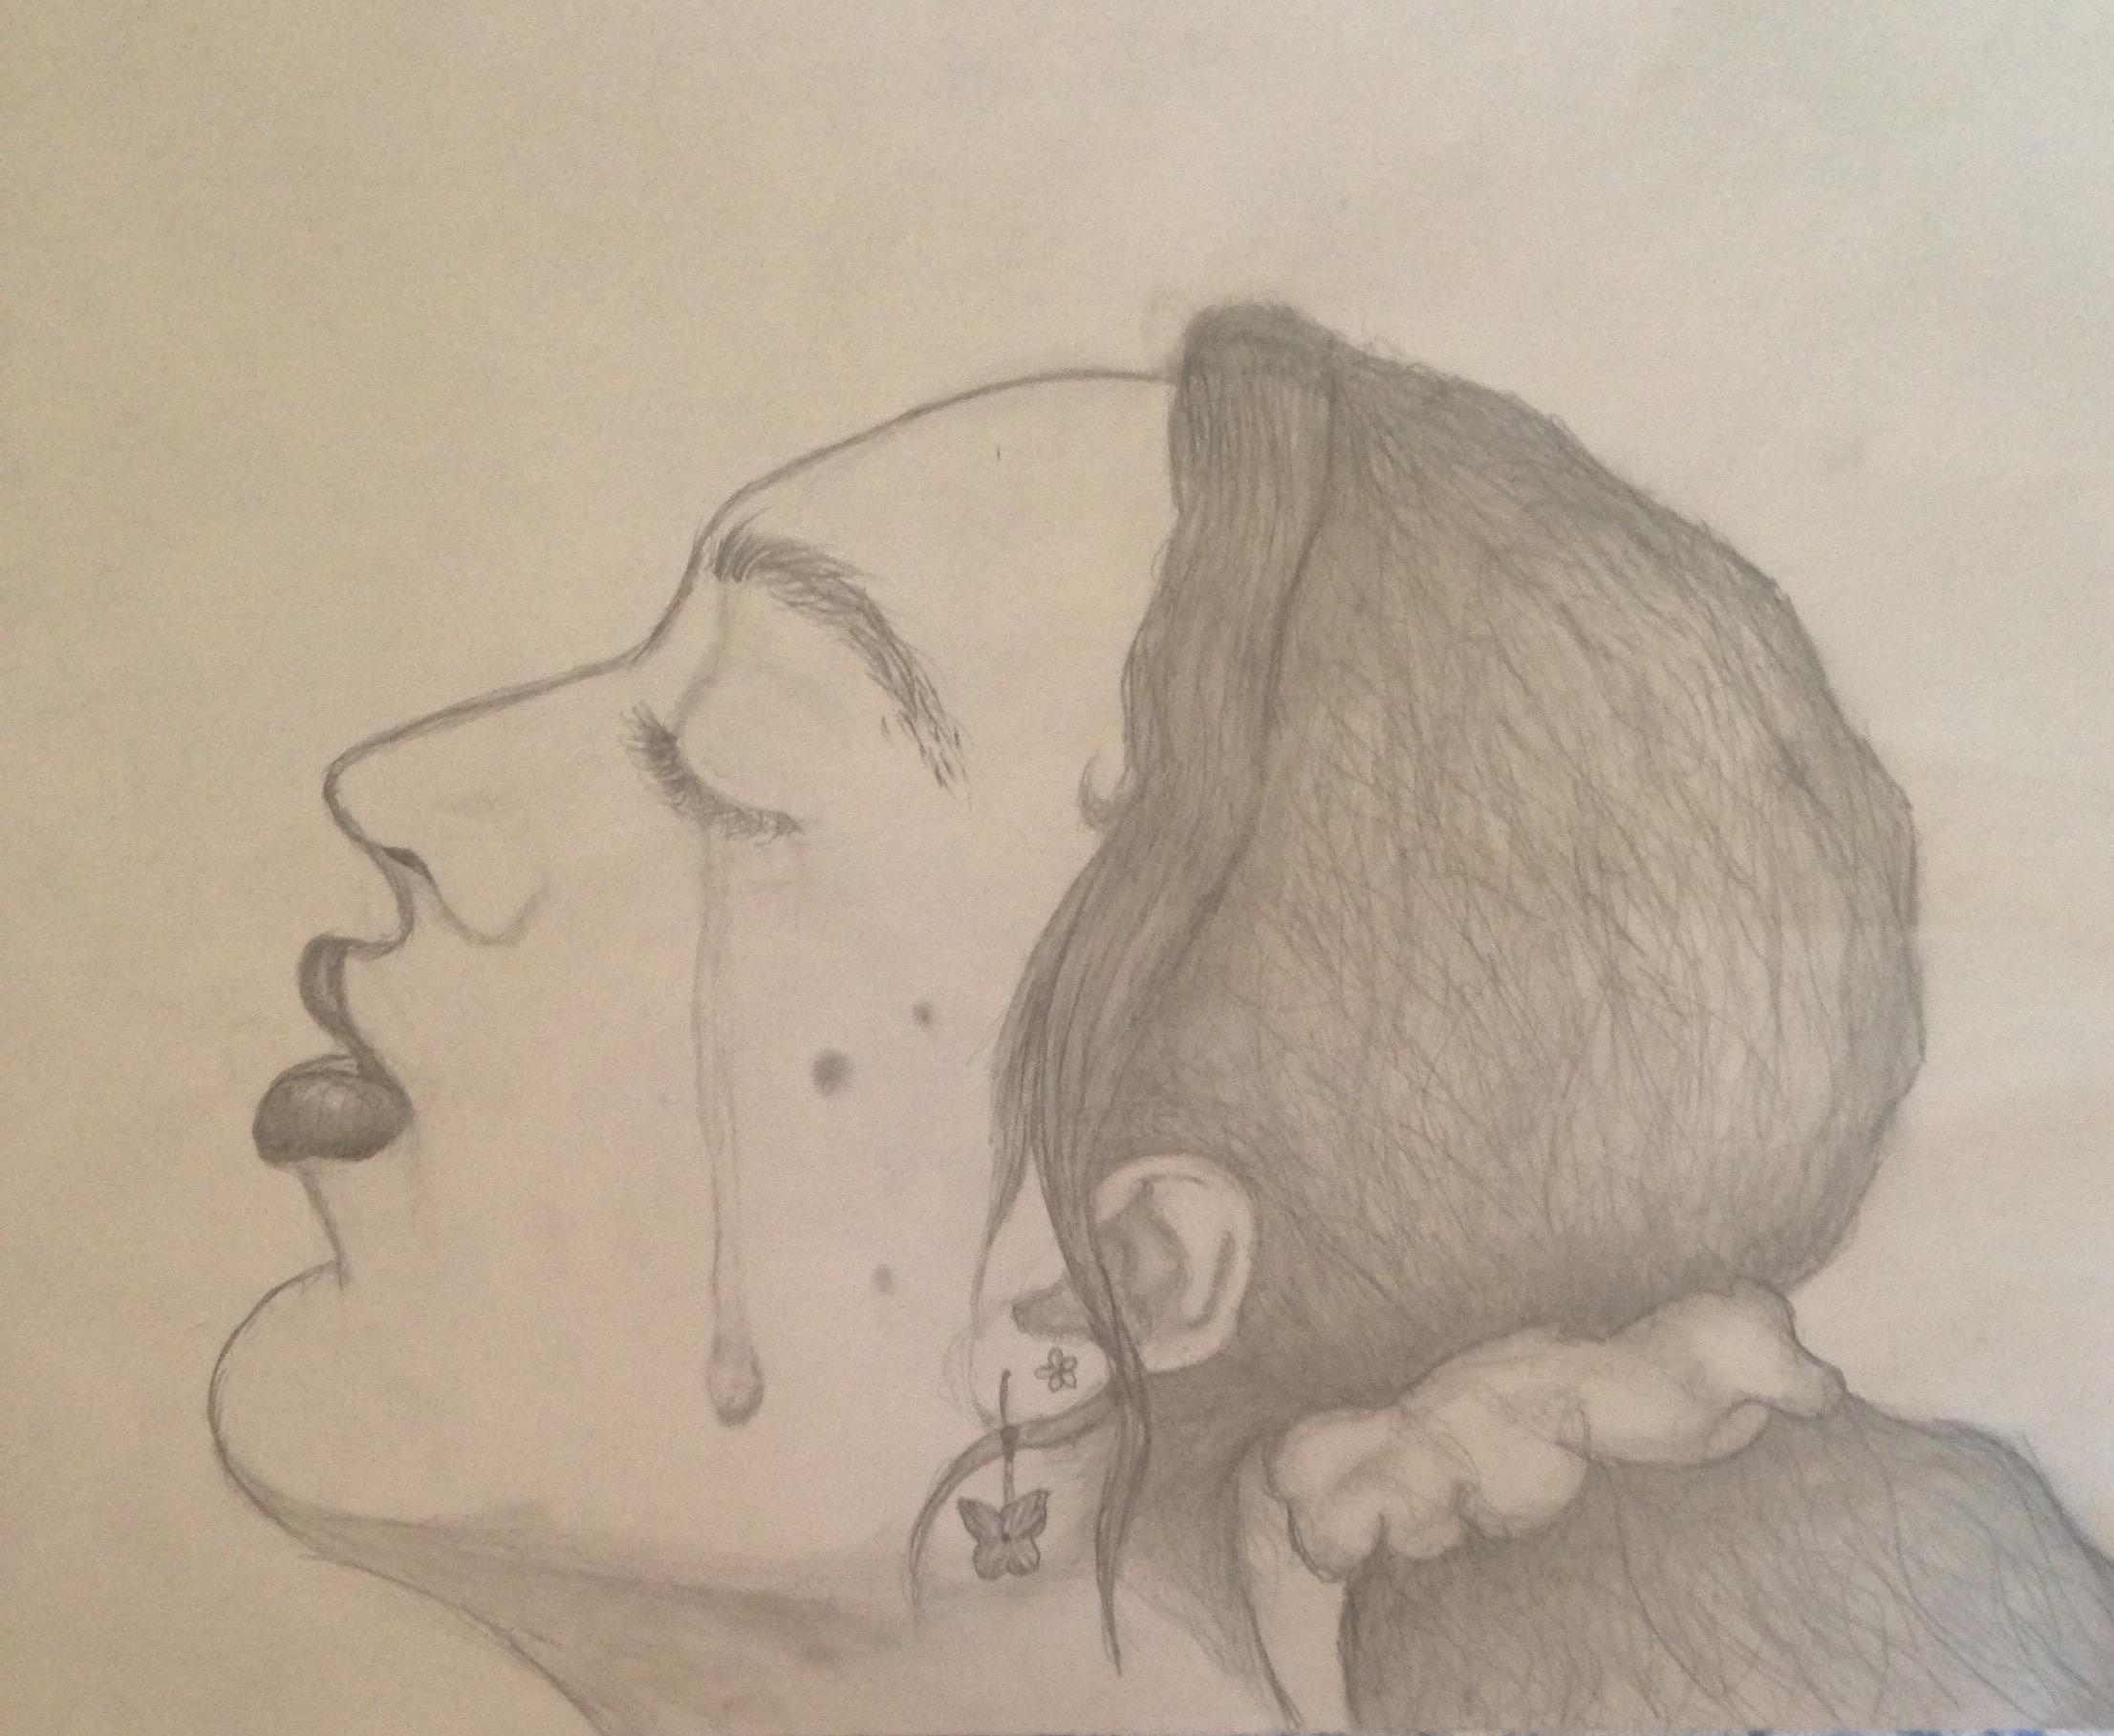 https://0201.nccdn.net/1_2/000/000/0bc/756/jasmine-eslami-art.jpg